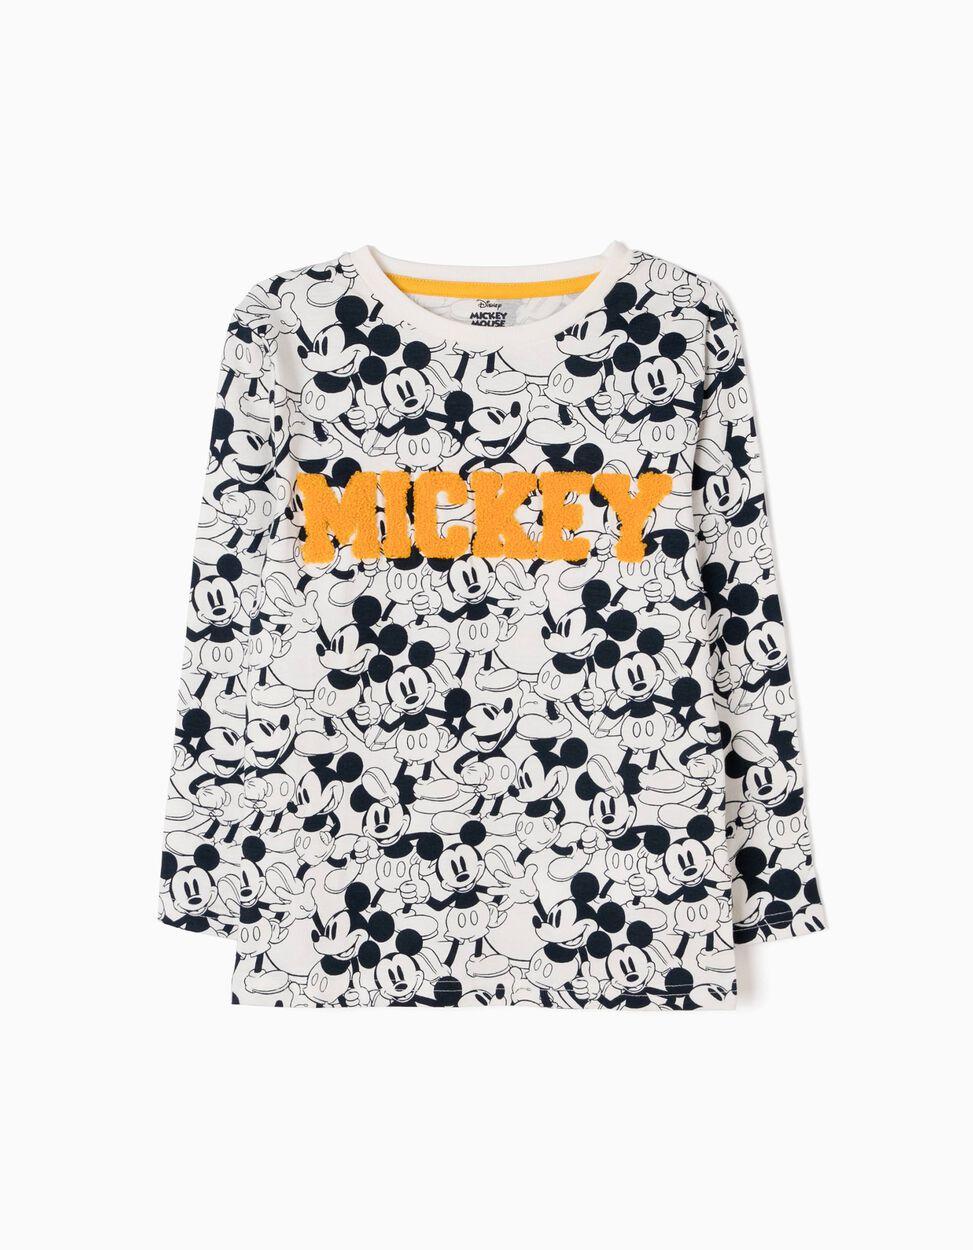 T-shirt Manga Comprida Mickey Mouse